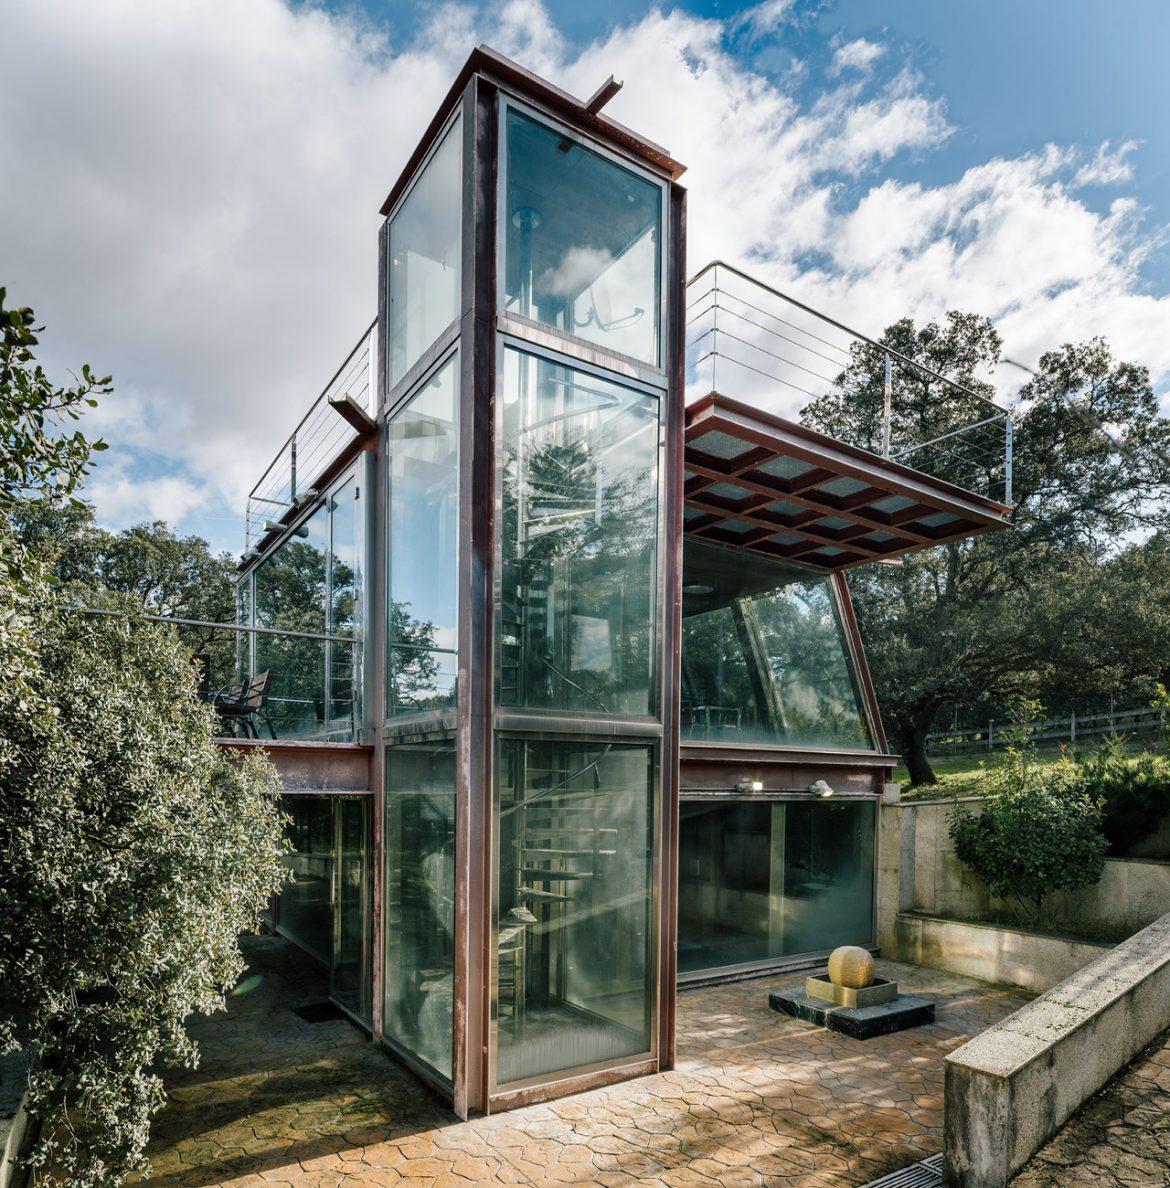 Рenelas Аrchitects (Испания). Дом для медитаций